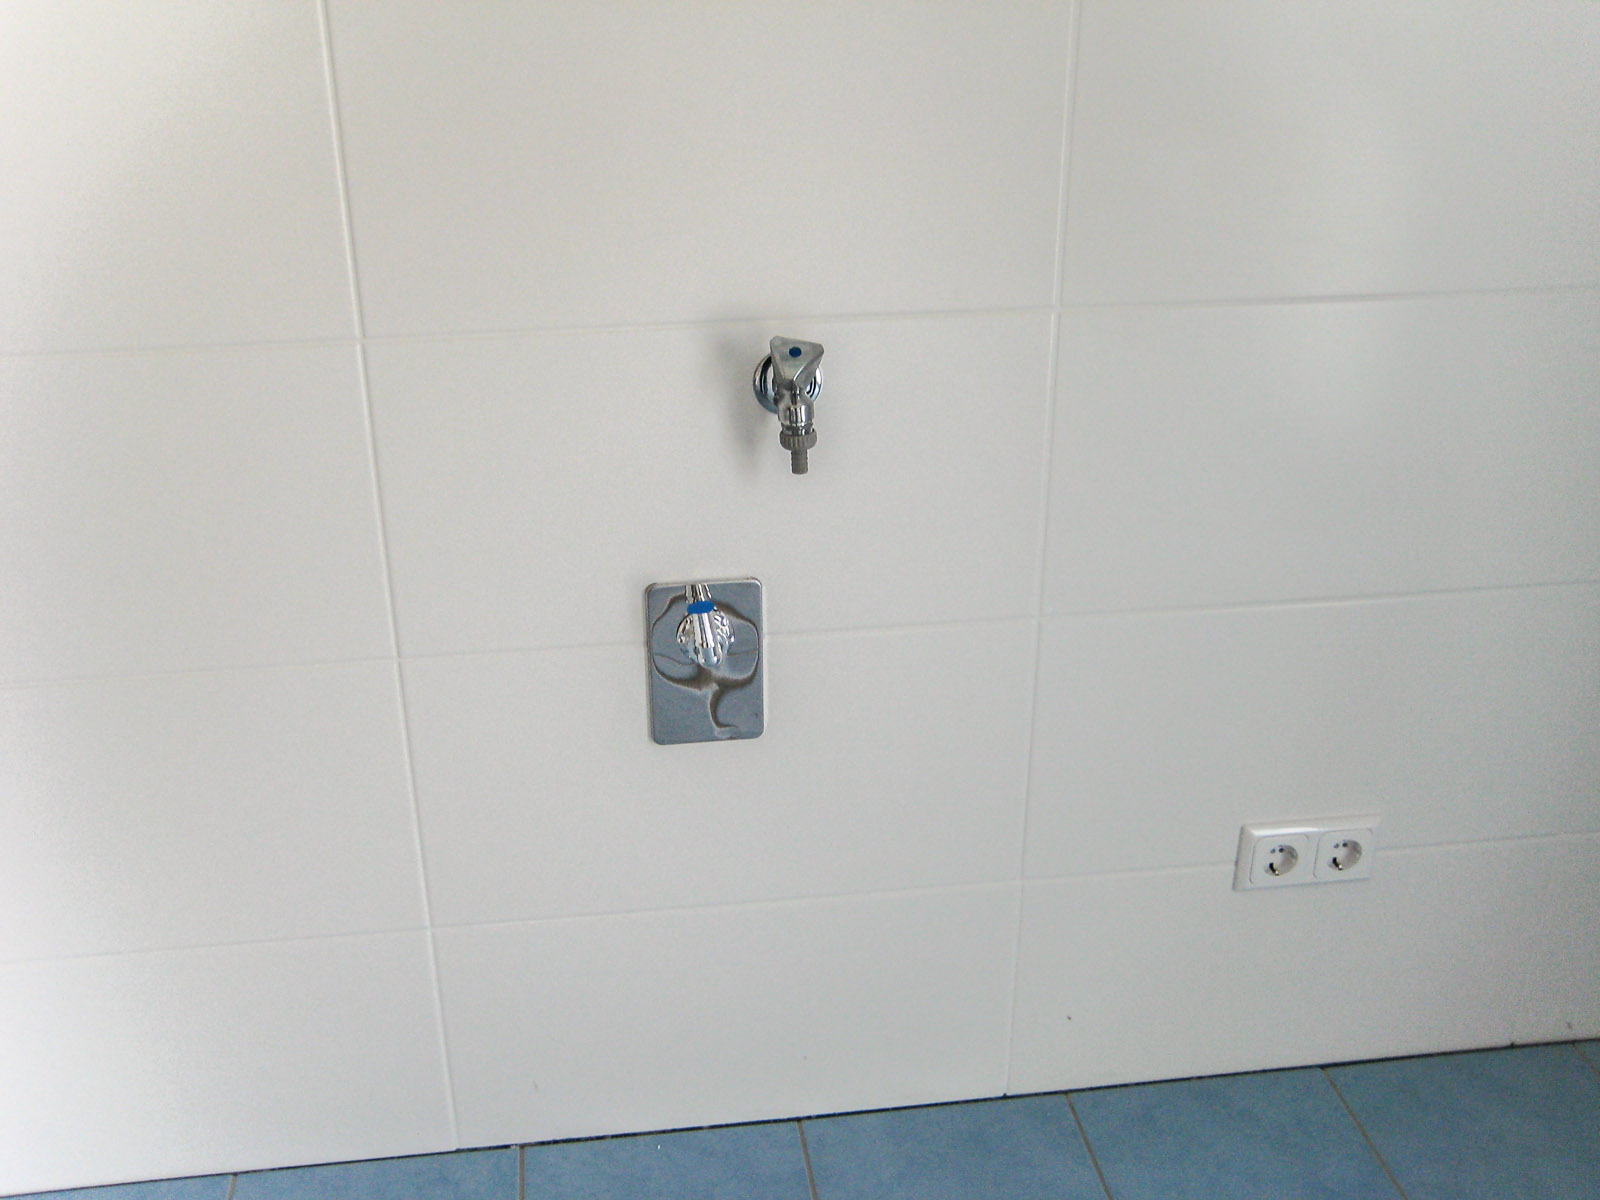 toilette verstopft was tun ucpueludger daldrup kommt bei. Black Bedroom Furniture Sets. Home Design Ideas